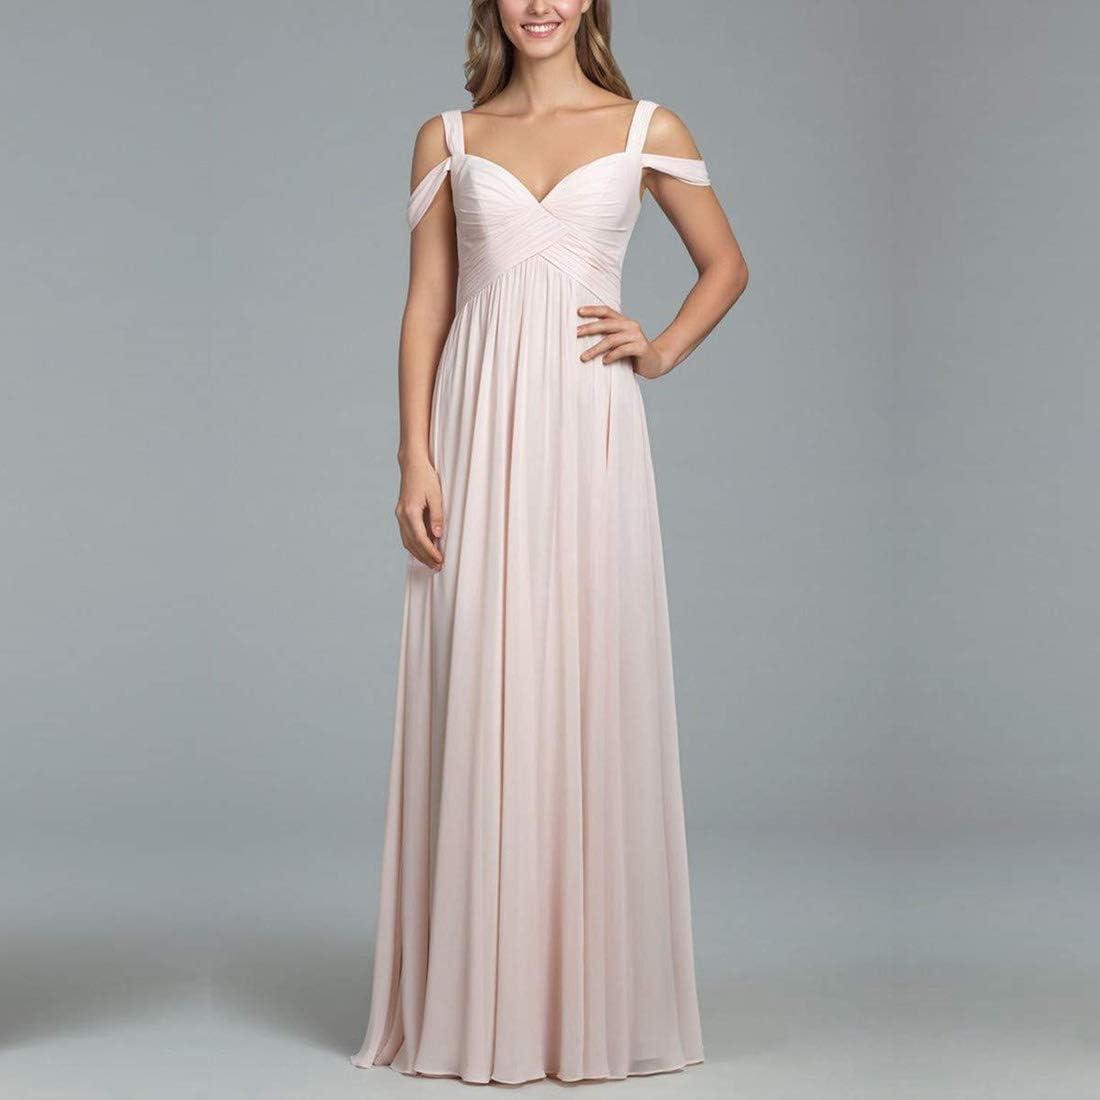 Women's Off Shoulder Chiffon Long Bridesmaid Dress Formal Evening Party Prom Gowns Chiffon Wedding Guest Dress